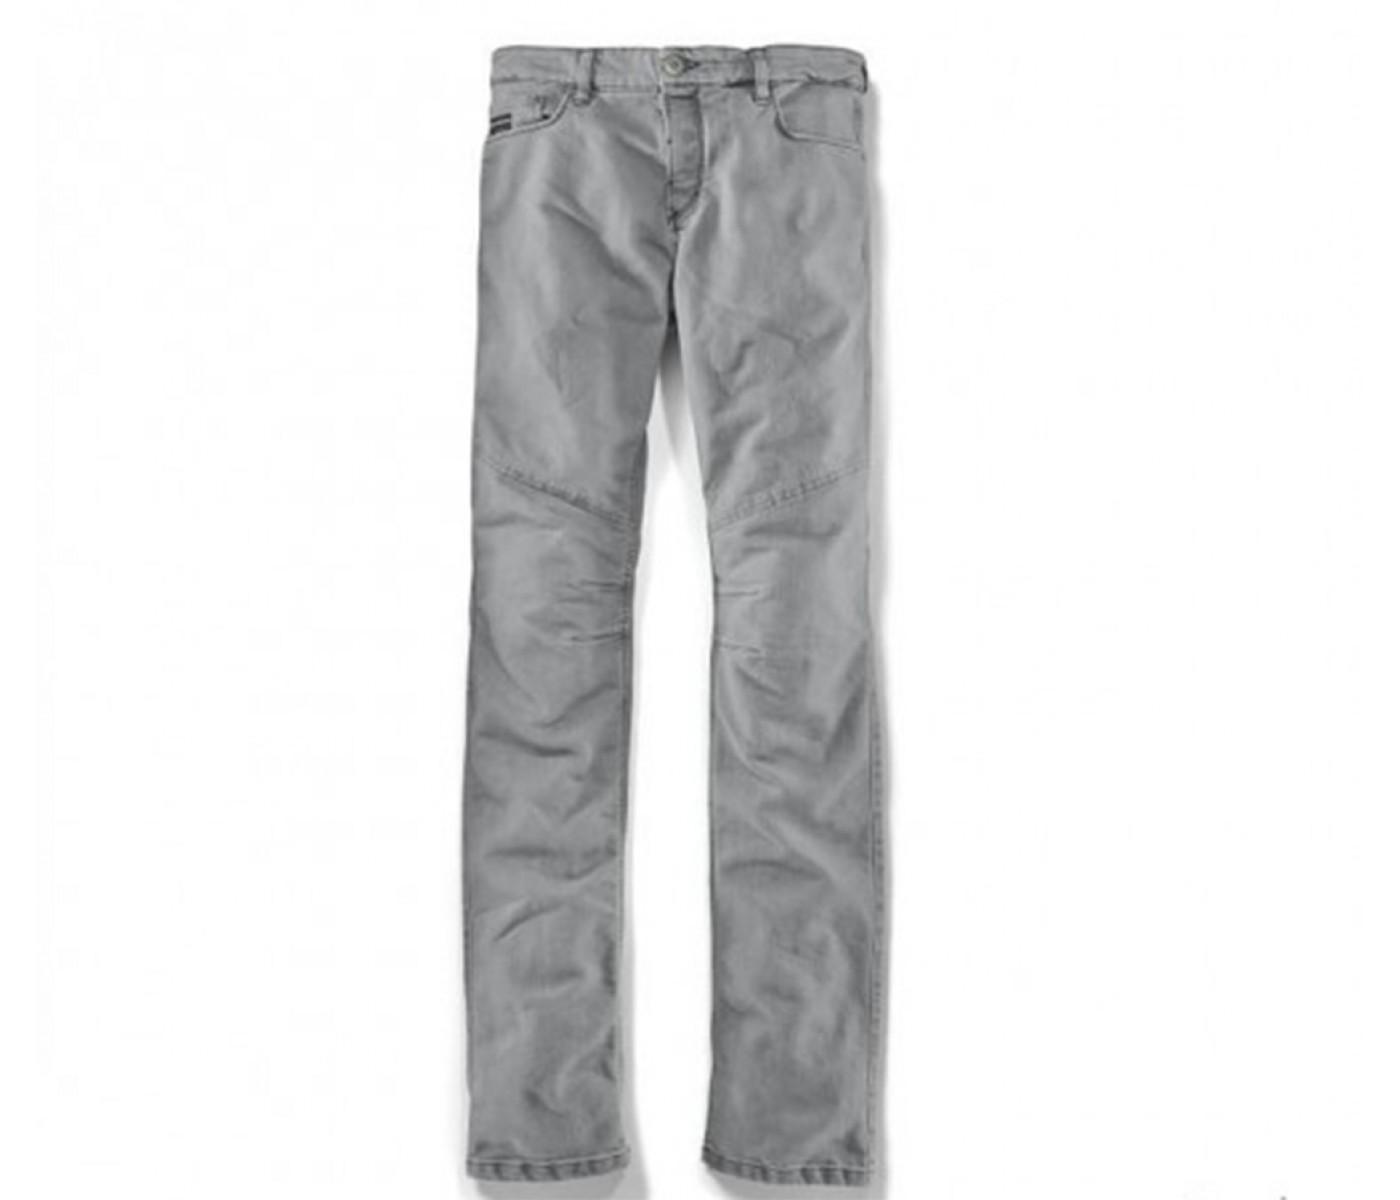 3c9cebfcdb85 -8% BMW Motorrad Παντελόνι Ανδρικό FivePocket Jeans Men Grey ΕΝΔΥΣΗ